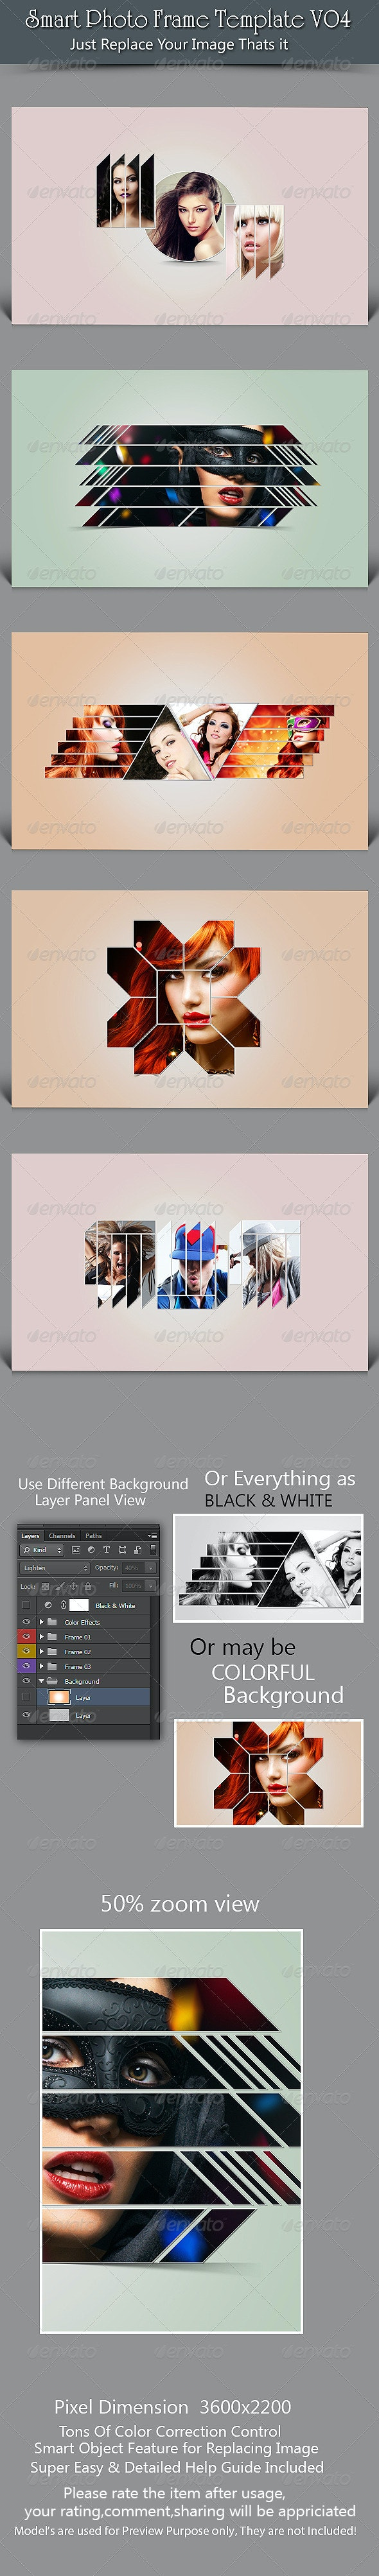 Smart Photo Frame Template V04 - Photo Templates Graphics